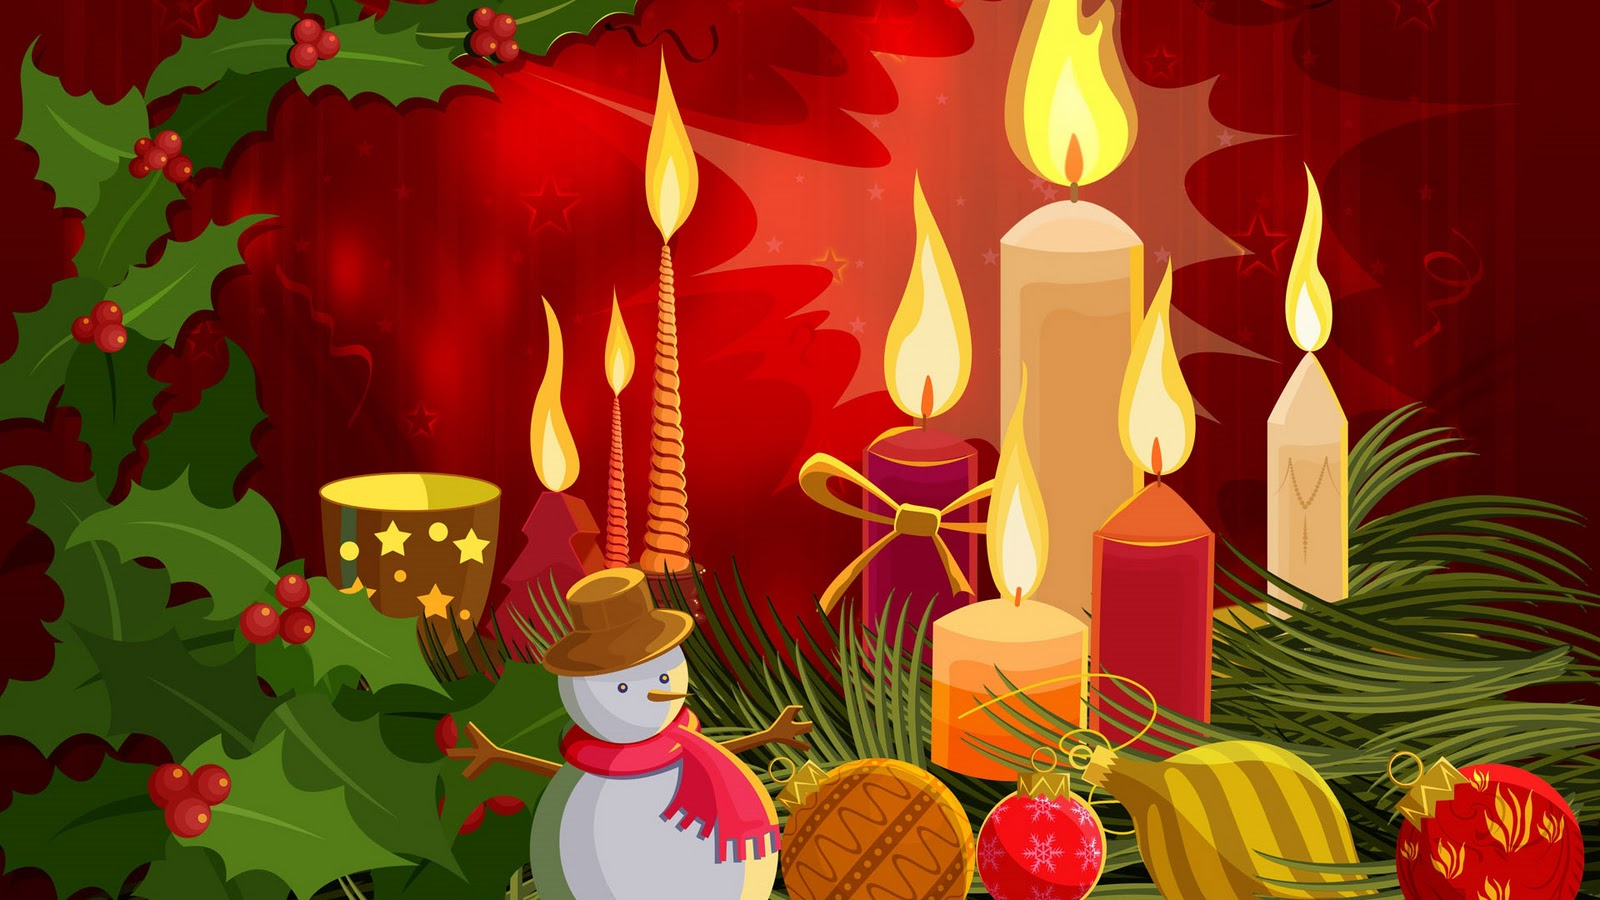 Bonewallpaper best desktop hd wallpapers christmas - Christmas wallpaper hd for desktop ...